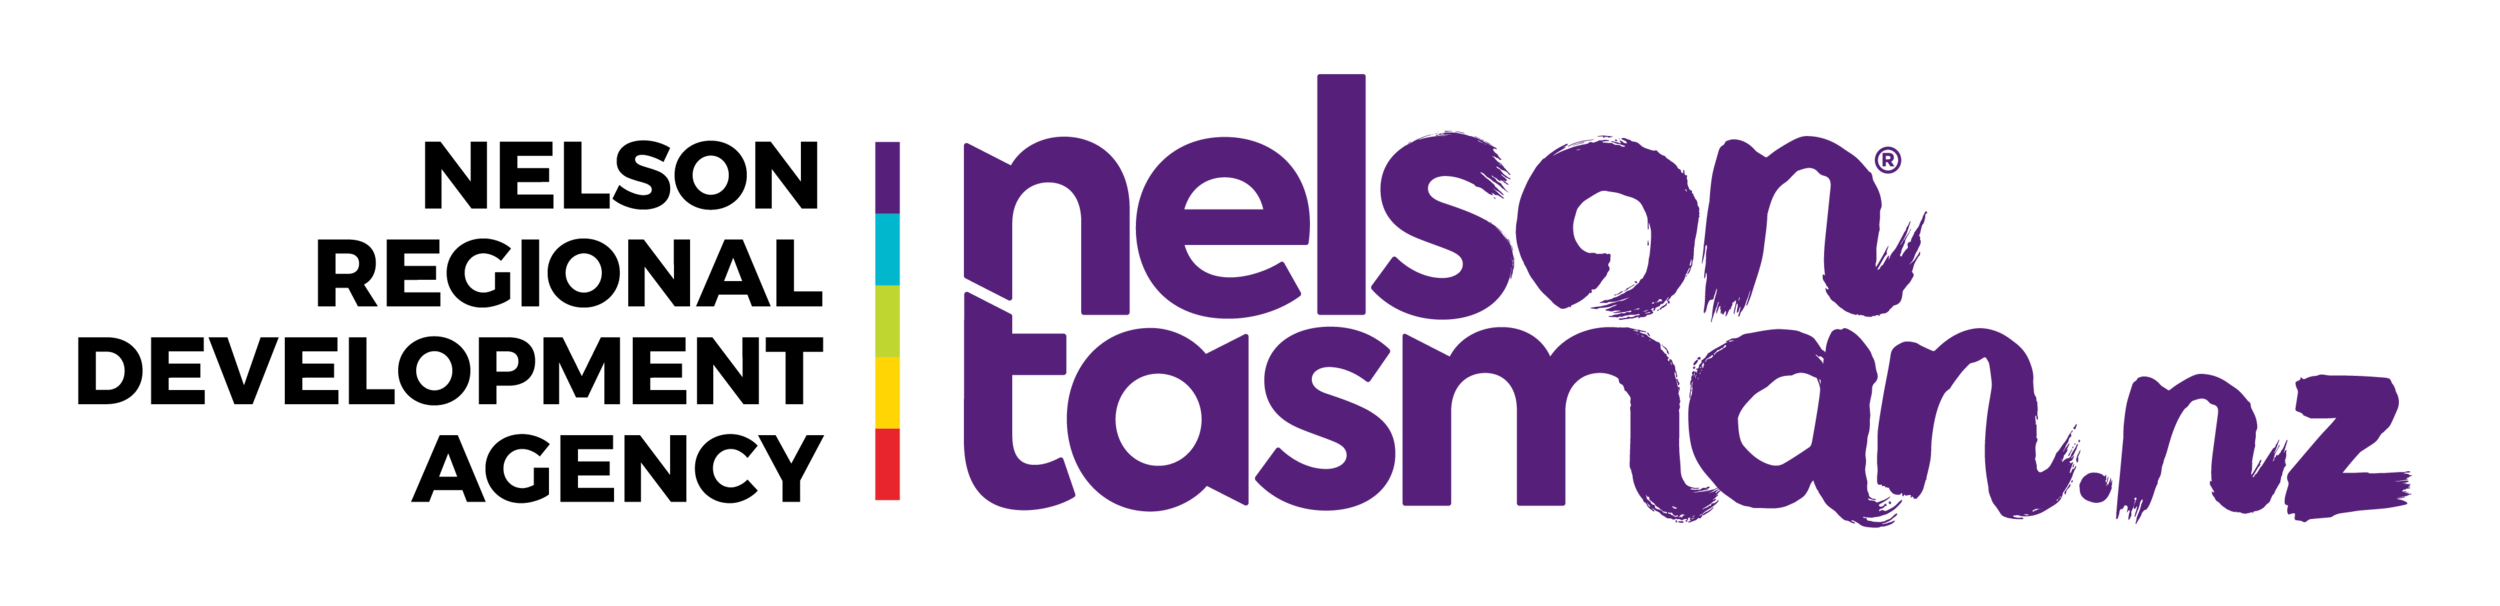 NRDA - Logo 2018-01.png